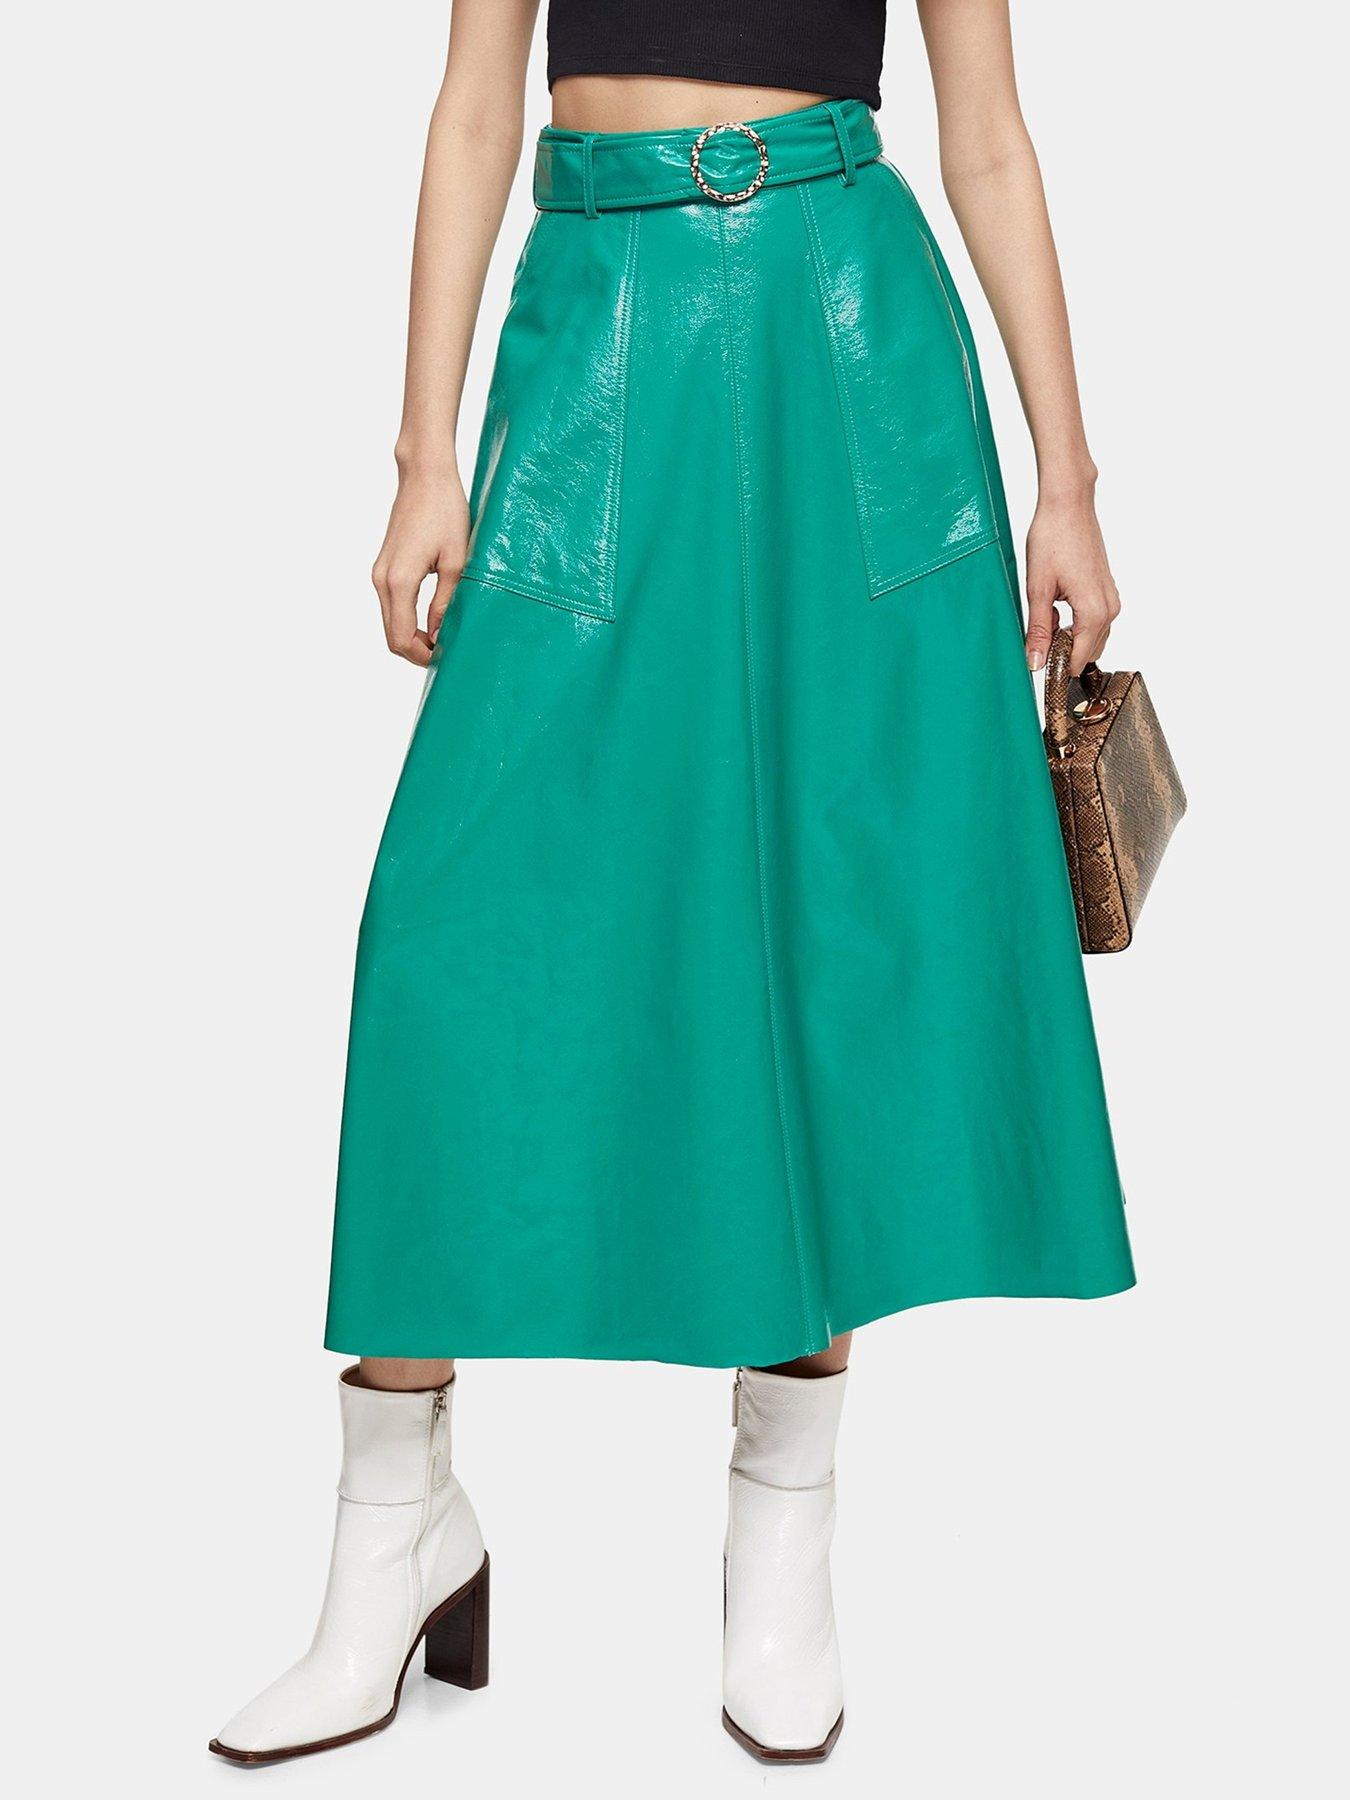 Miss Blush Black Faux Leather Wrap Skirt Size 10